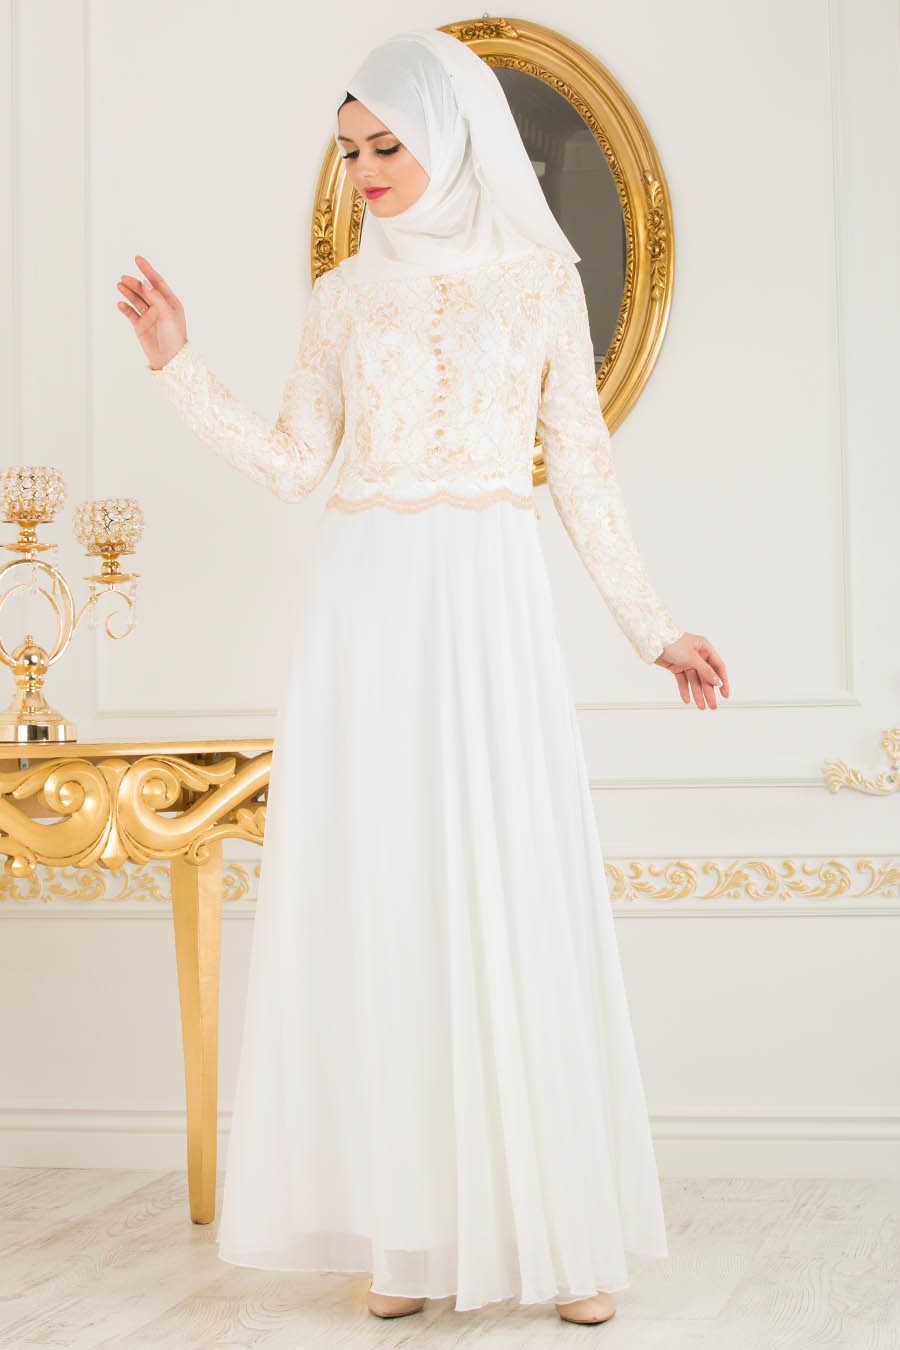 0496014bc933 Neva Style - White Hijab Evening Dress 7960B - Neva-style.com